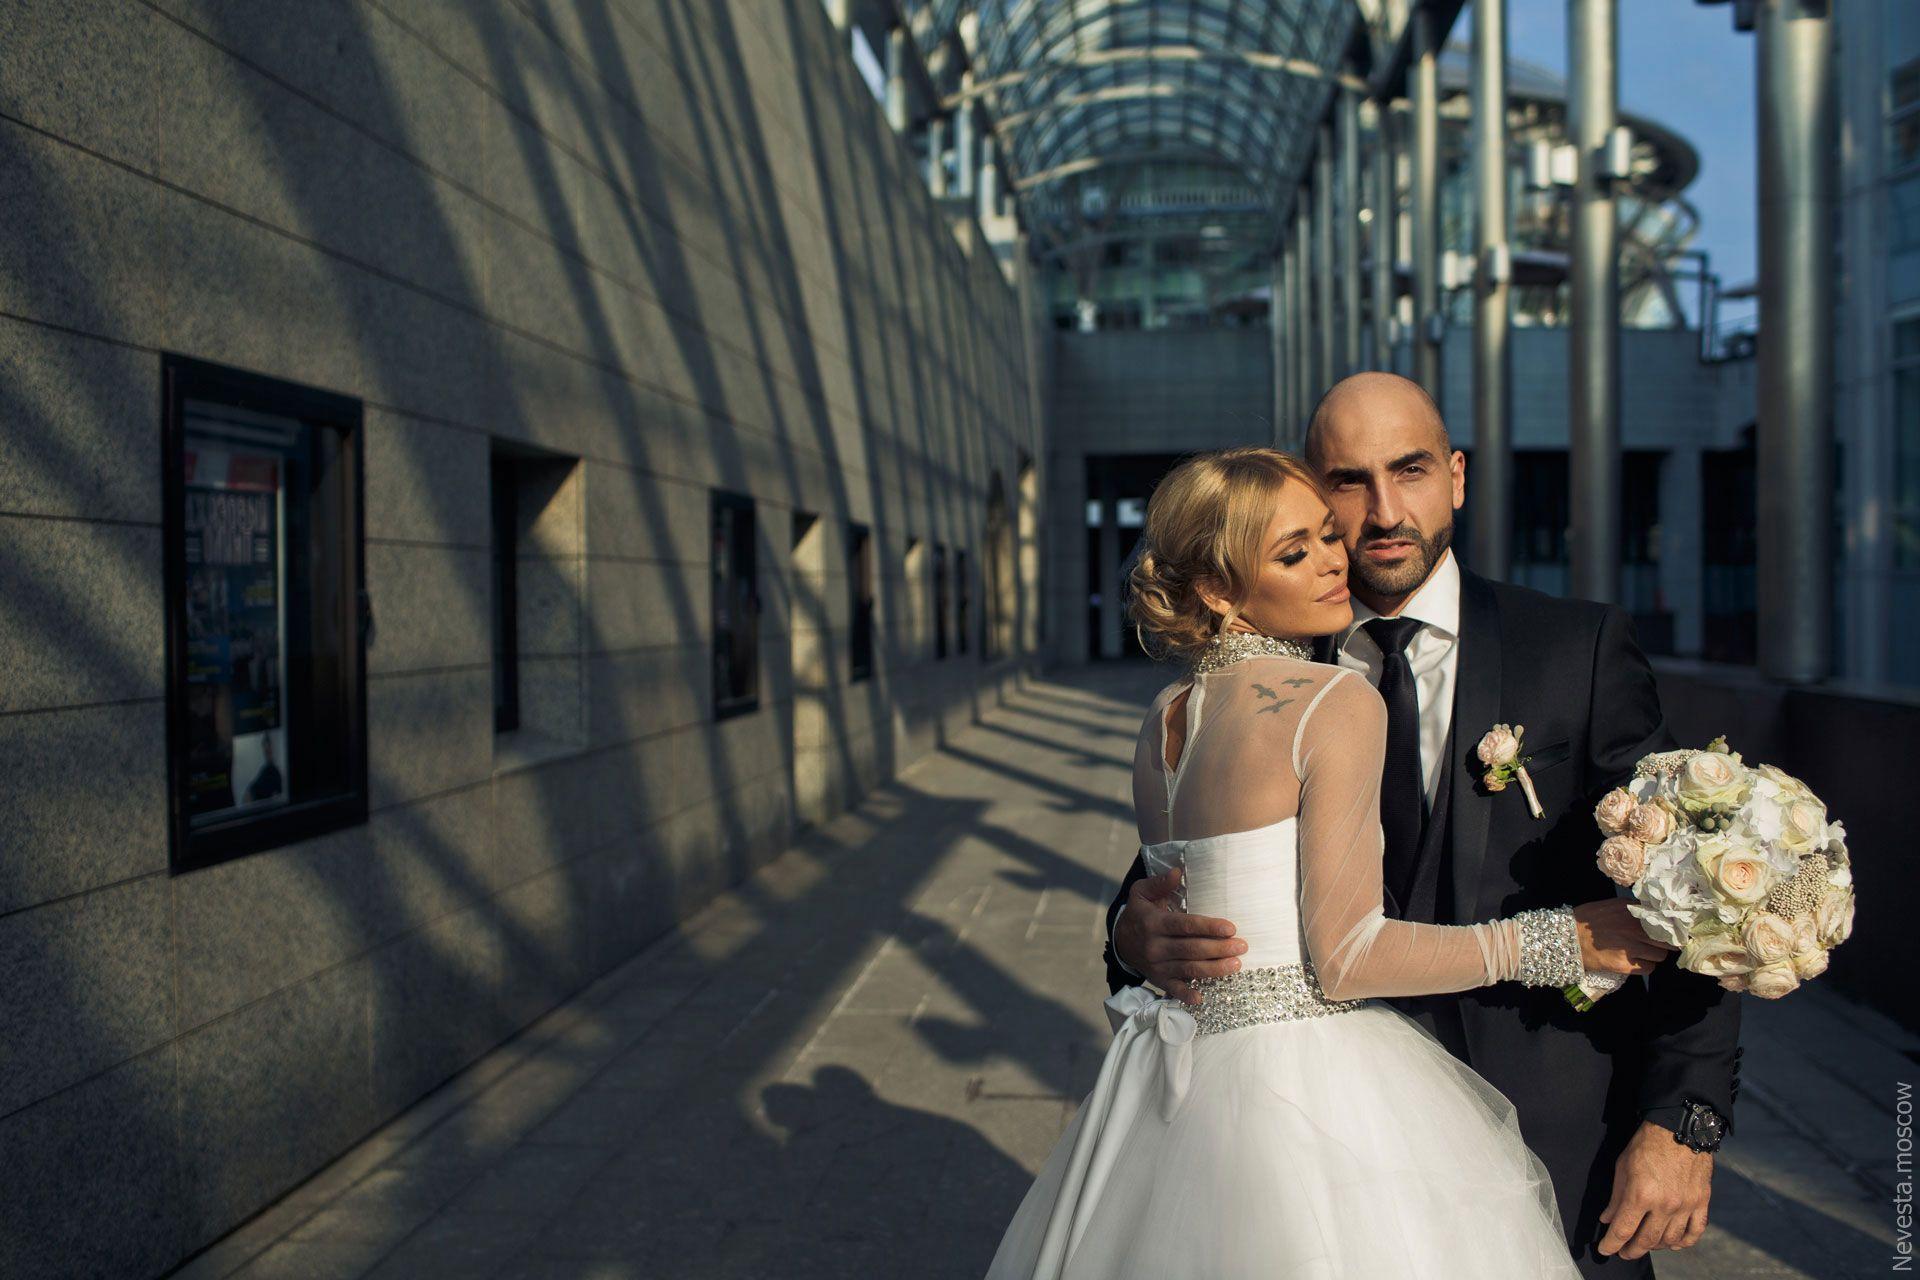 Свадьба Анны Хилькевич и Артура Волкова, фото 8